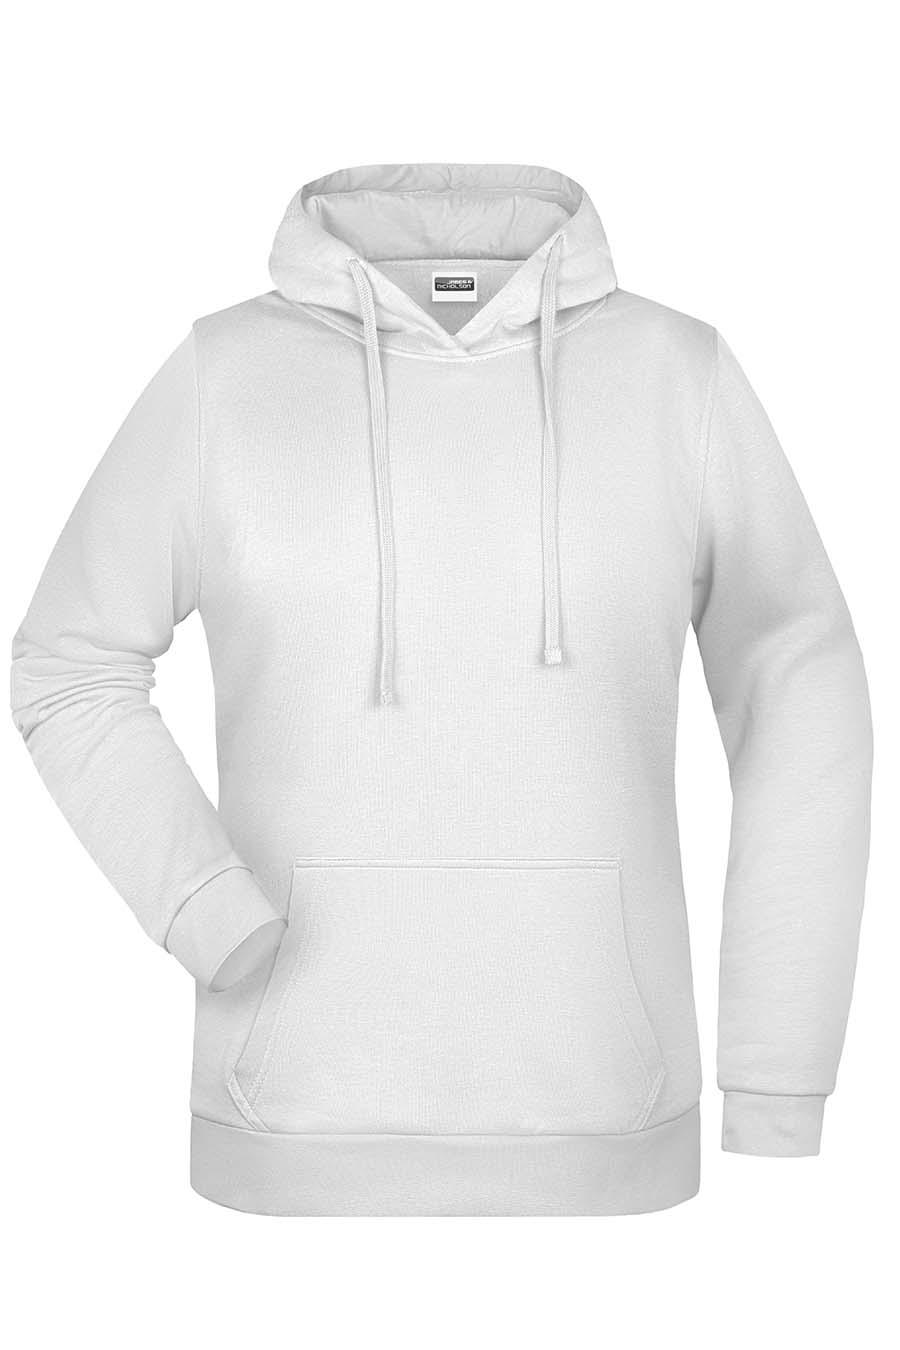 Sweat-shirt capuche femme - 20-1494-20